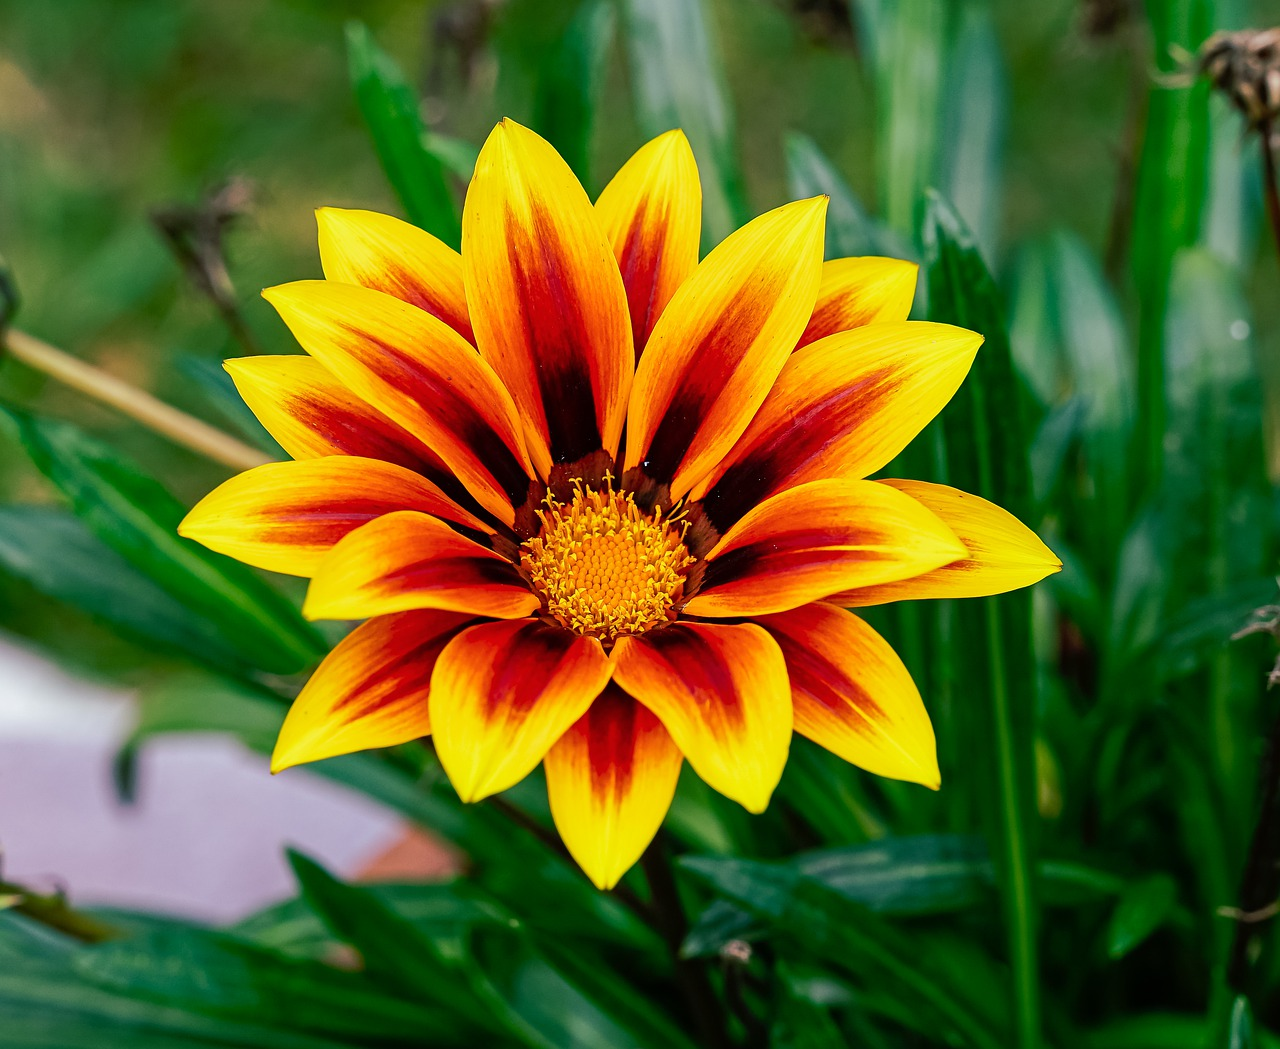 Flower Petals Gazania Plant Leaves  - mirceaadrian72 / Pixabay